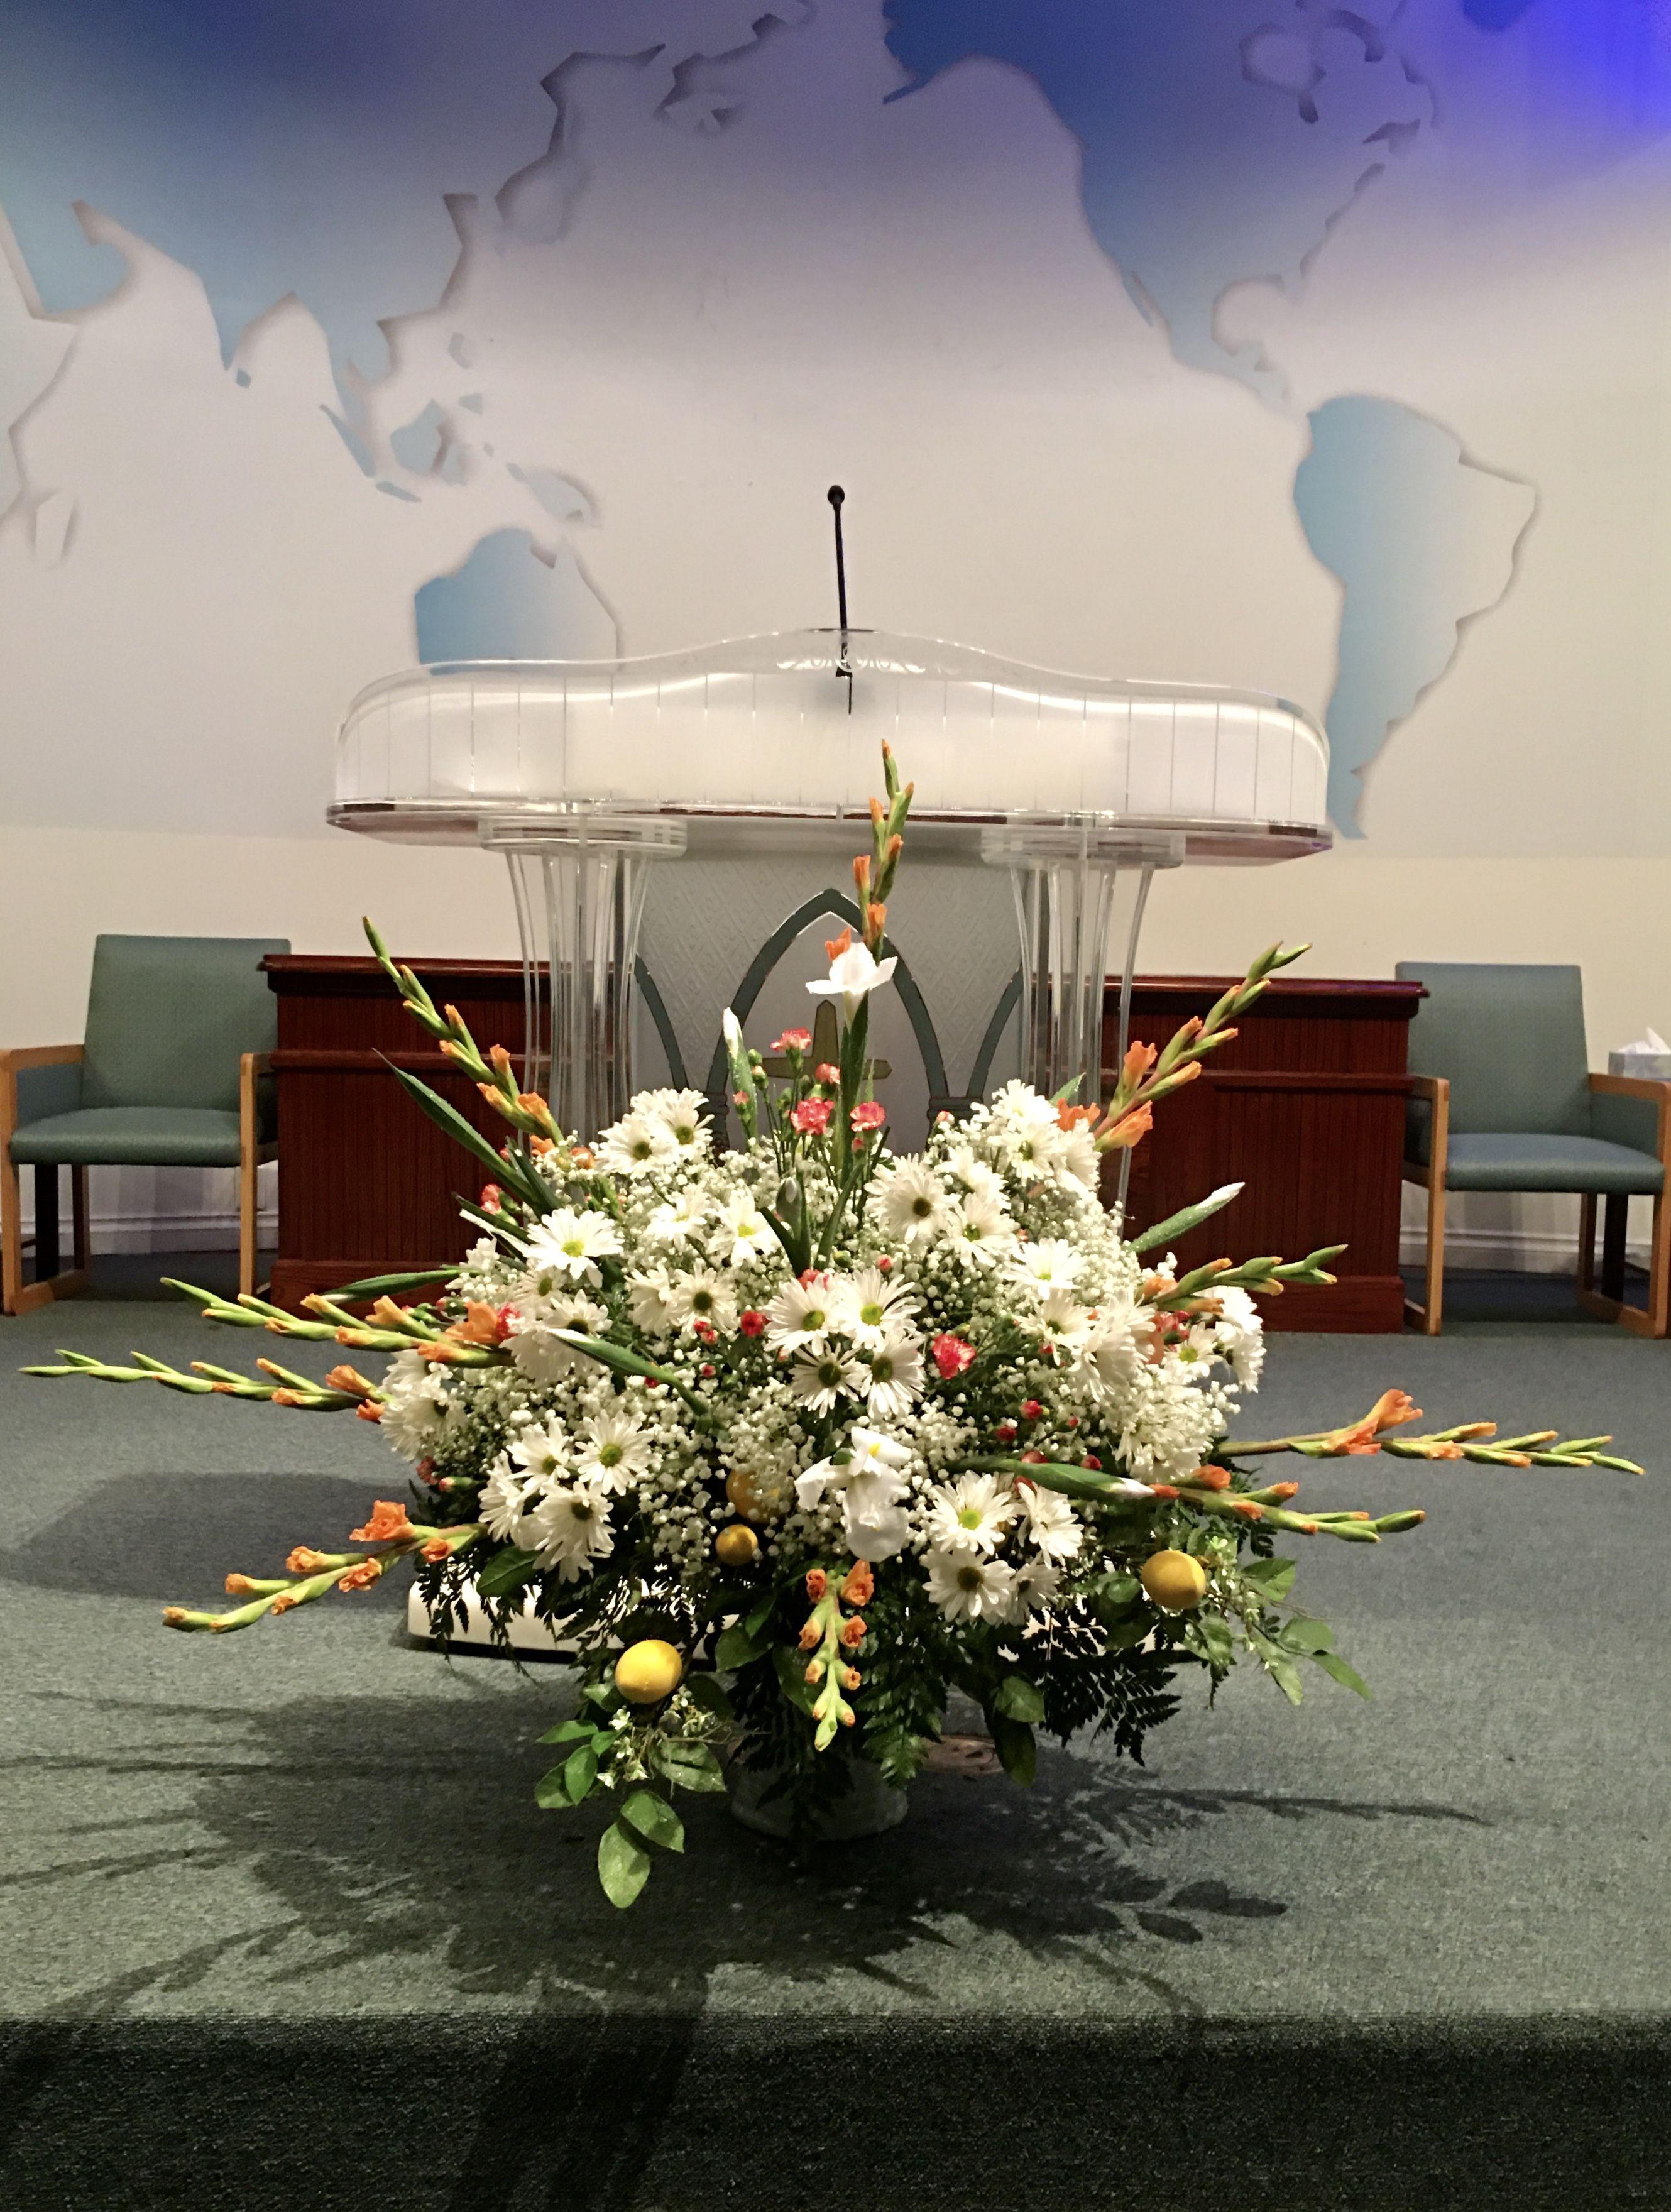 Pin by Jan Lim on Church Flower Arrangement in 2020